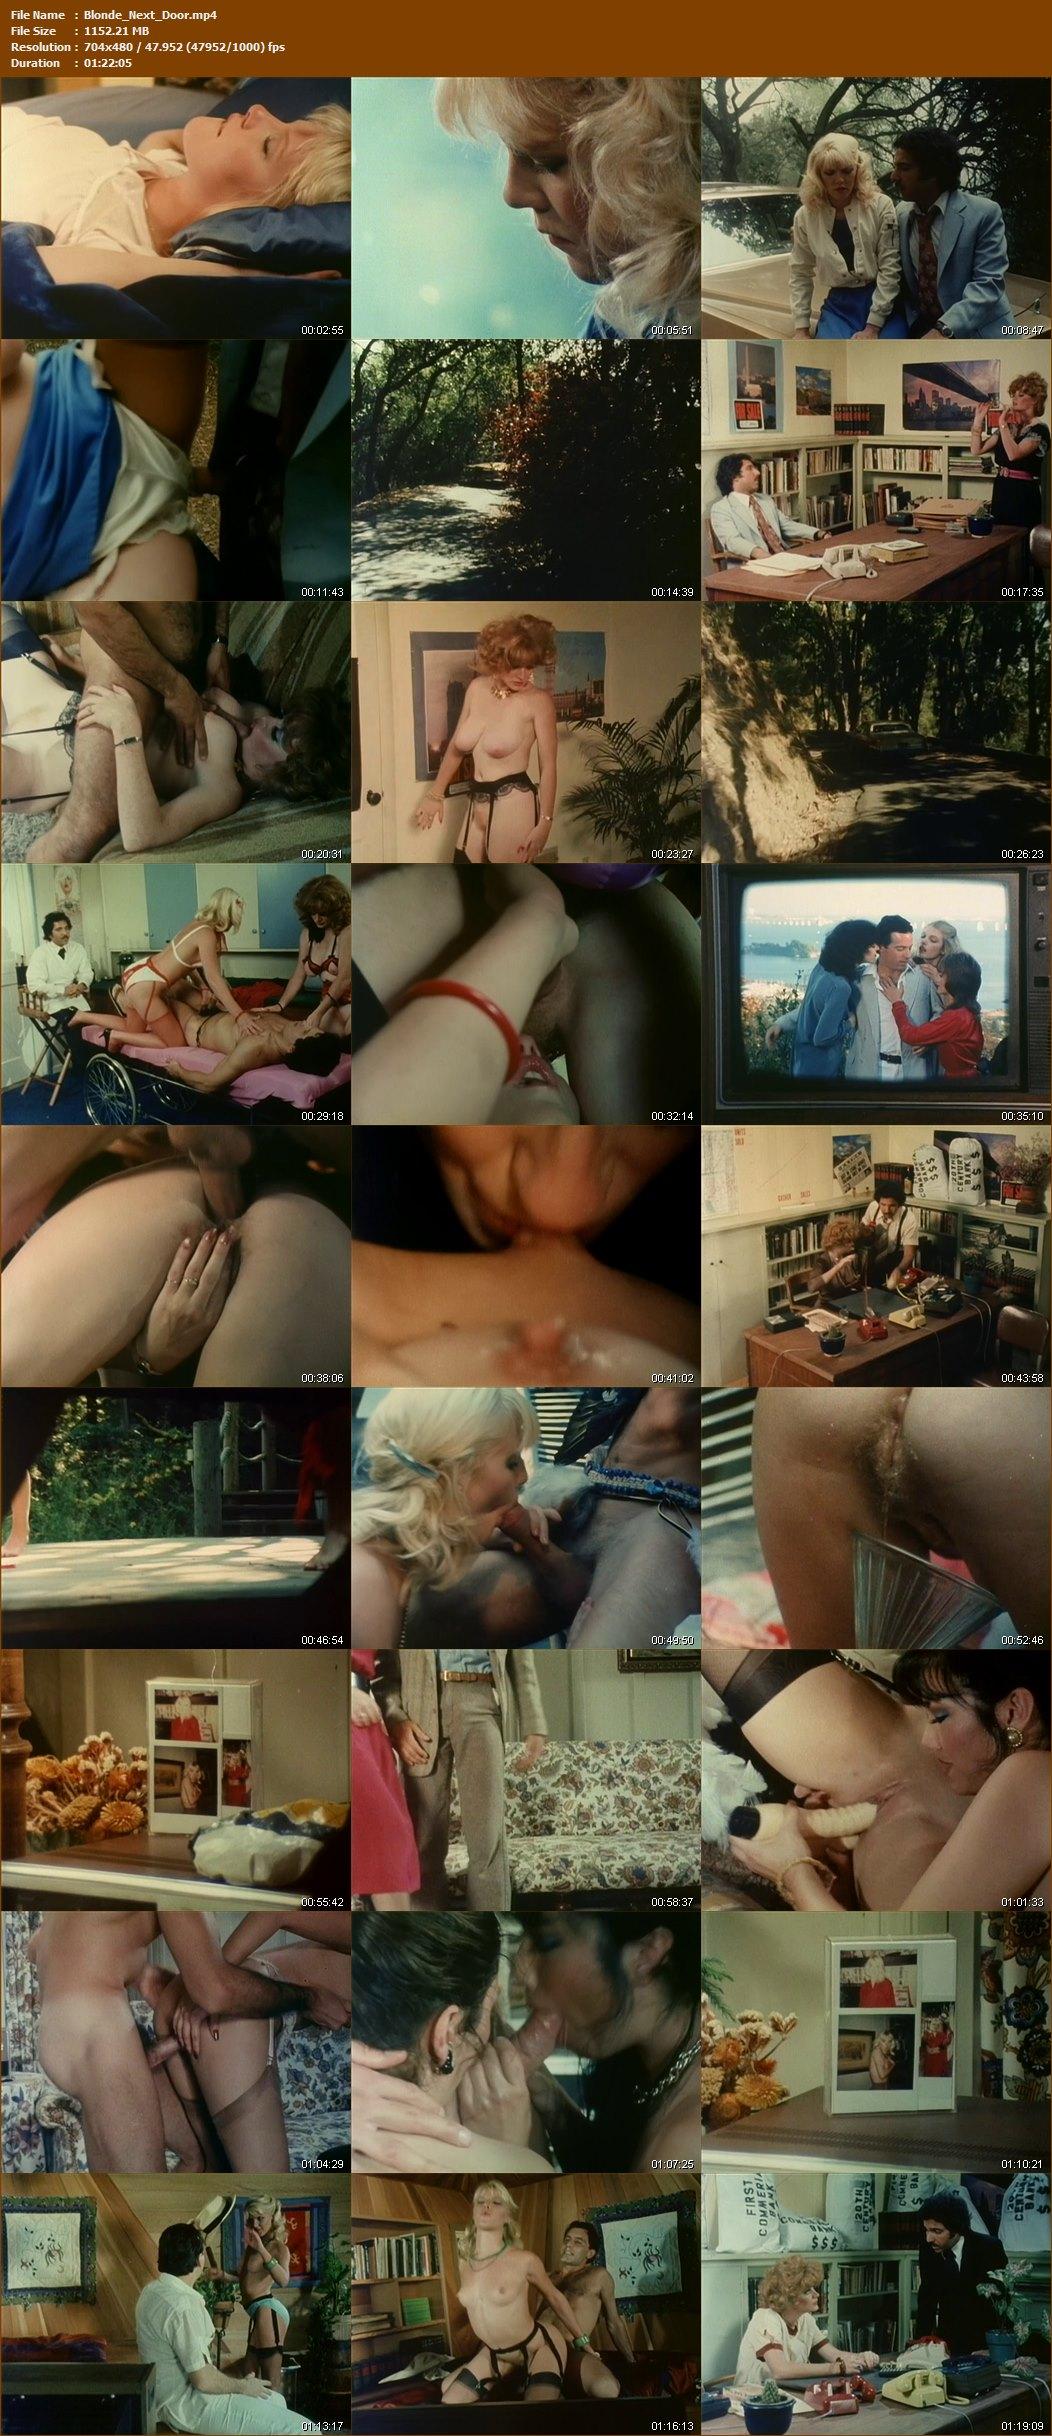 Tracey adams mike horner john leslie in vintage porn site 10